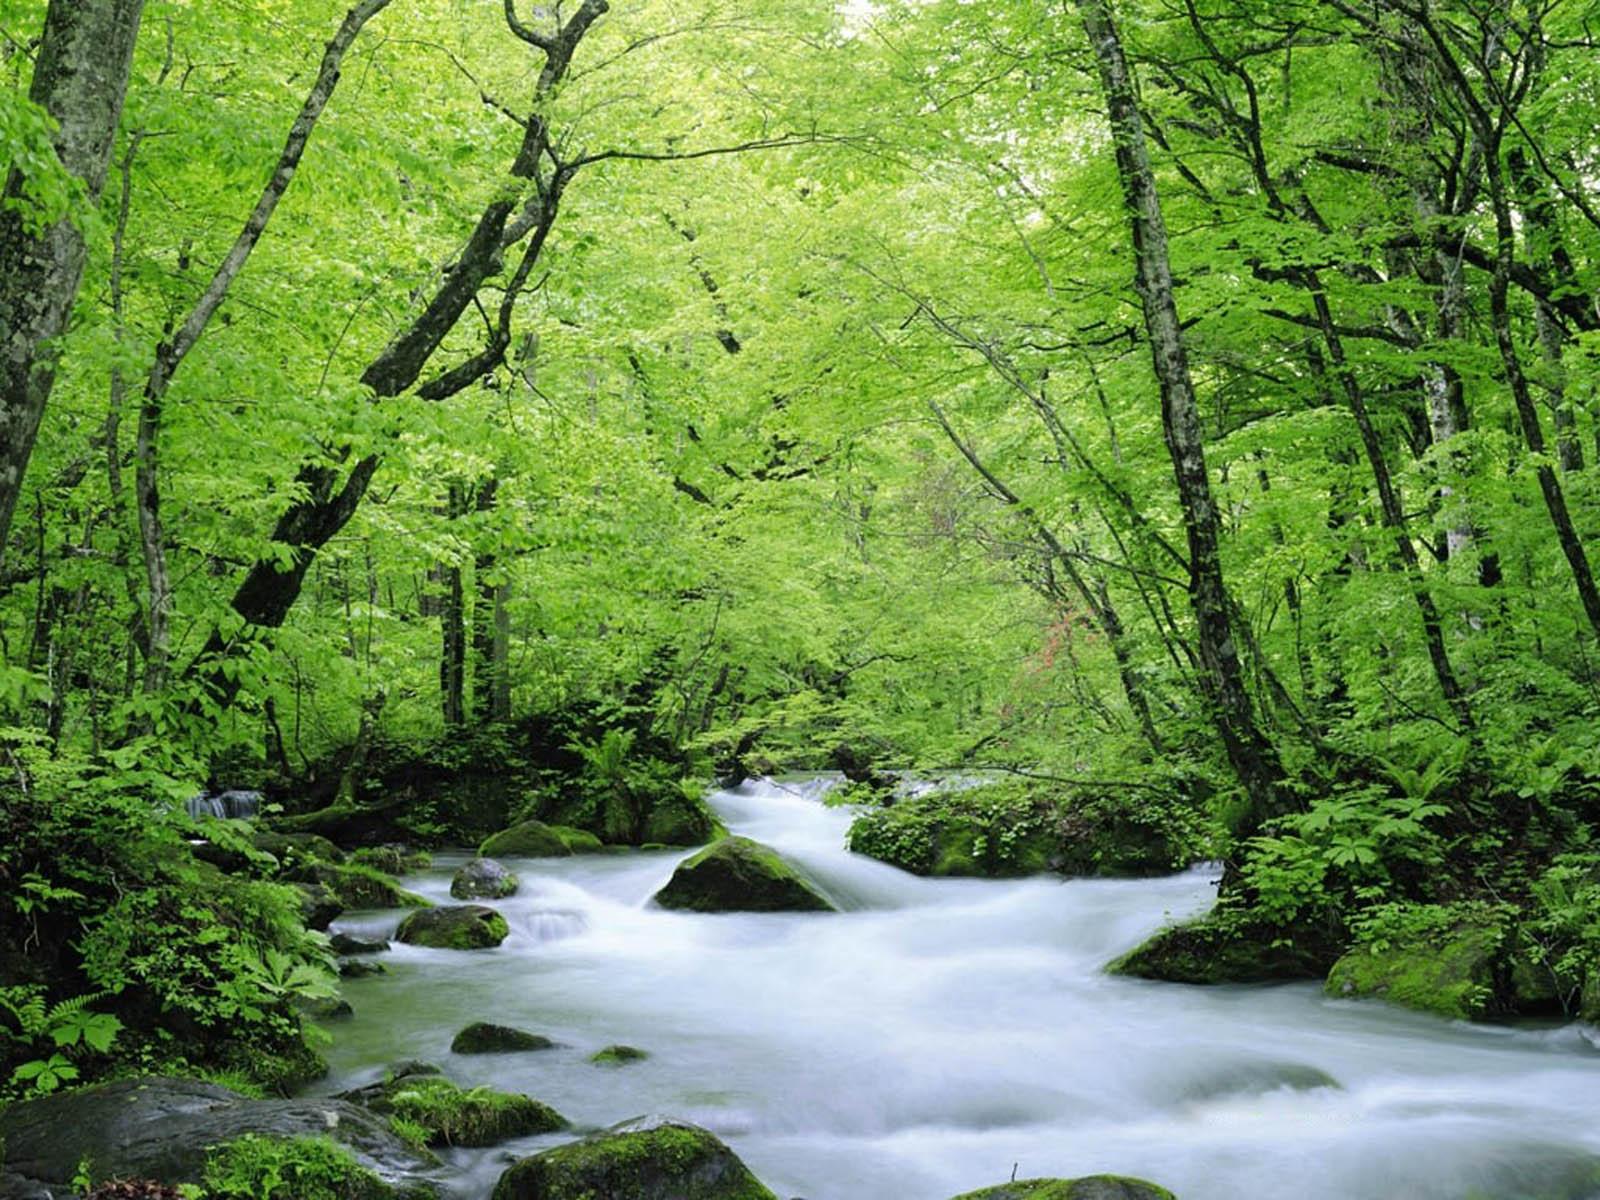 httpwallpapers xsblogspotcom201212green nature wallpapershtml 1600x1200